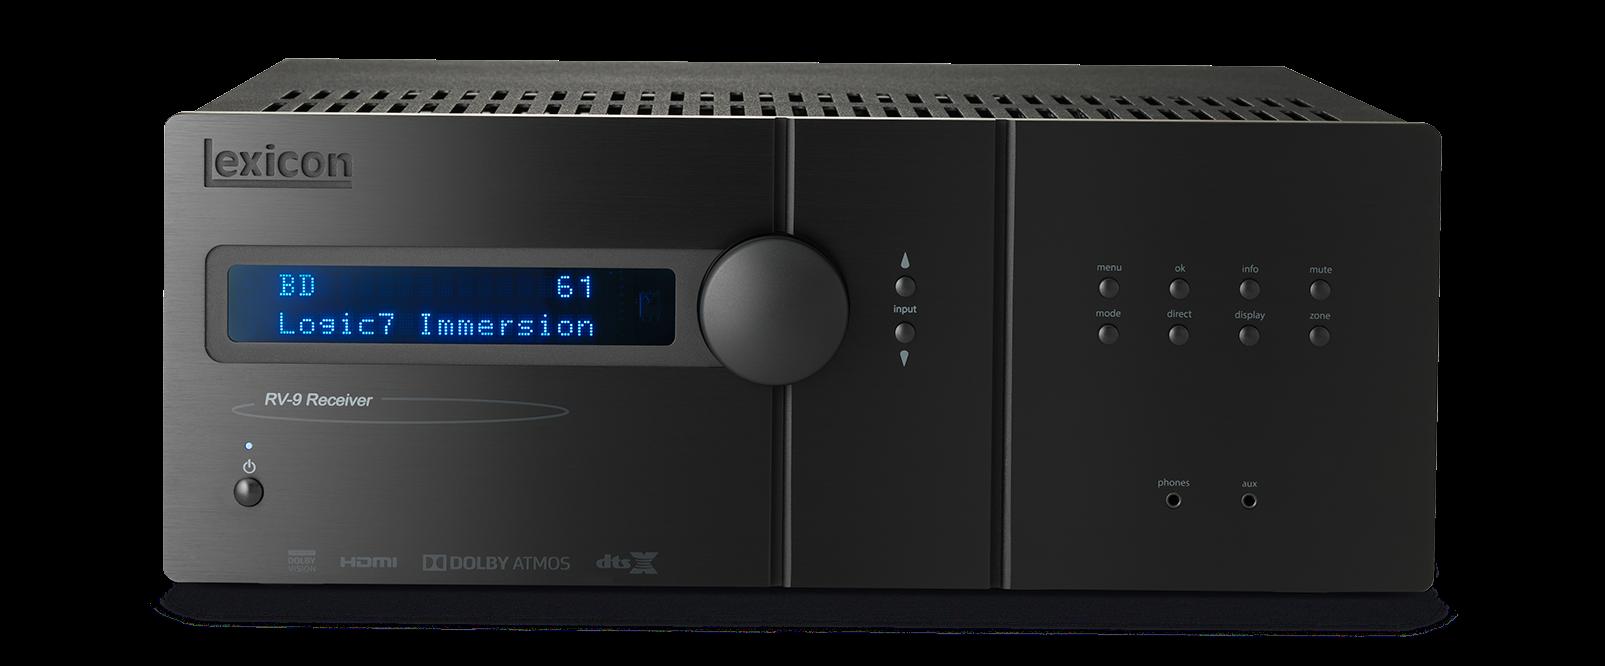 Lexicon RV 9 Audio Video Receiver